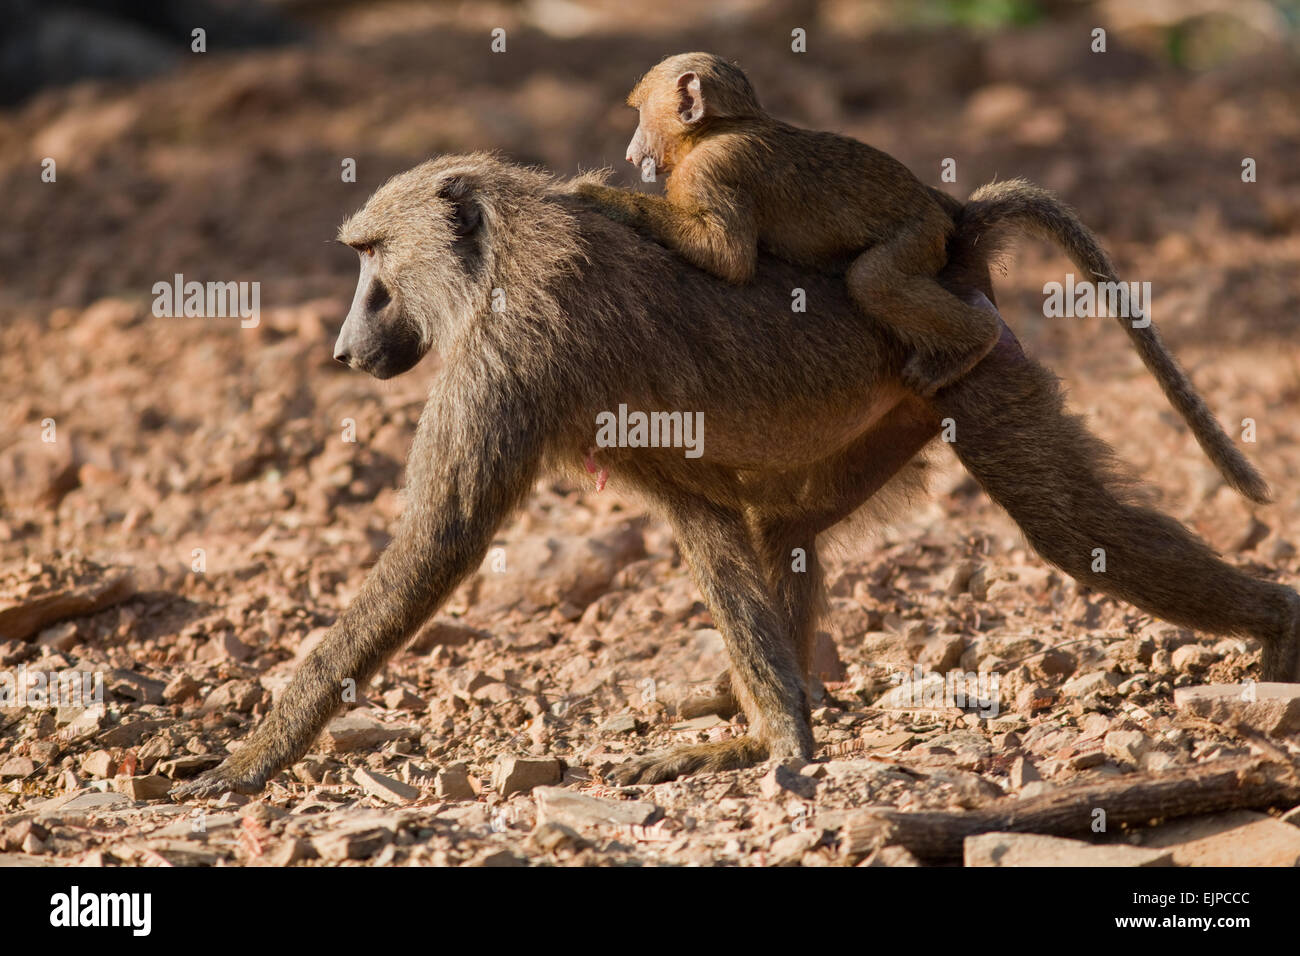 Oliva o Anubis babbuini (papio anubis). Femmine e giovani. Il Ghana. Africa occidentale. Mole National Park. Immagini Stock